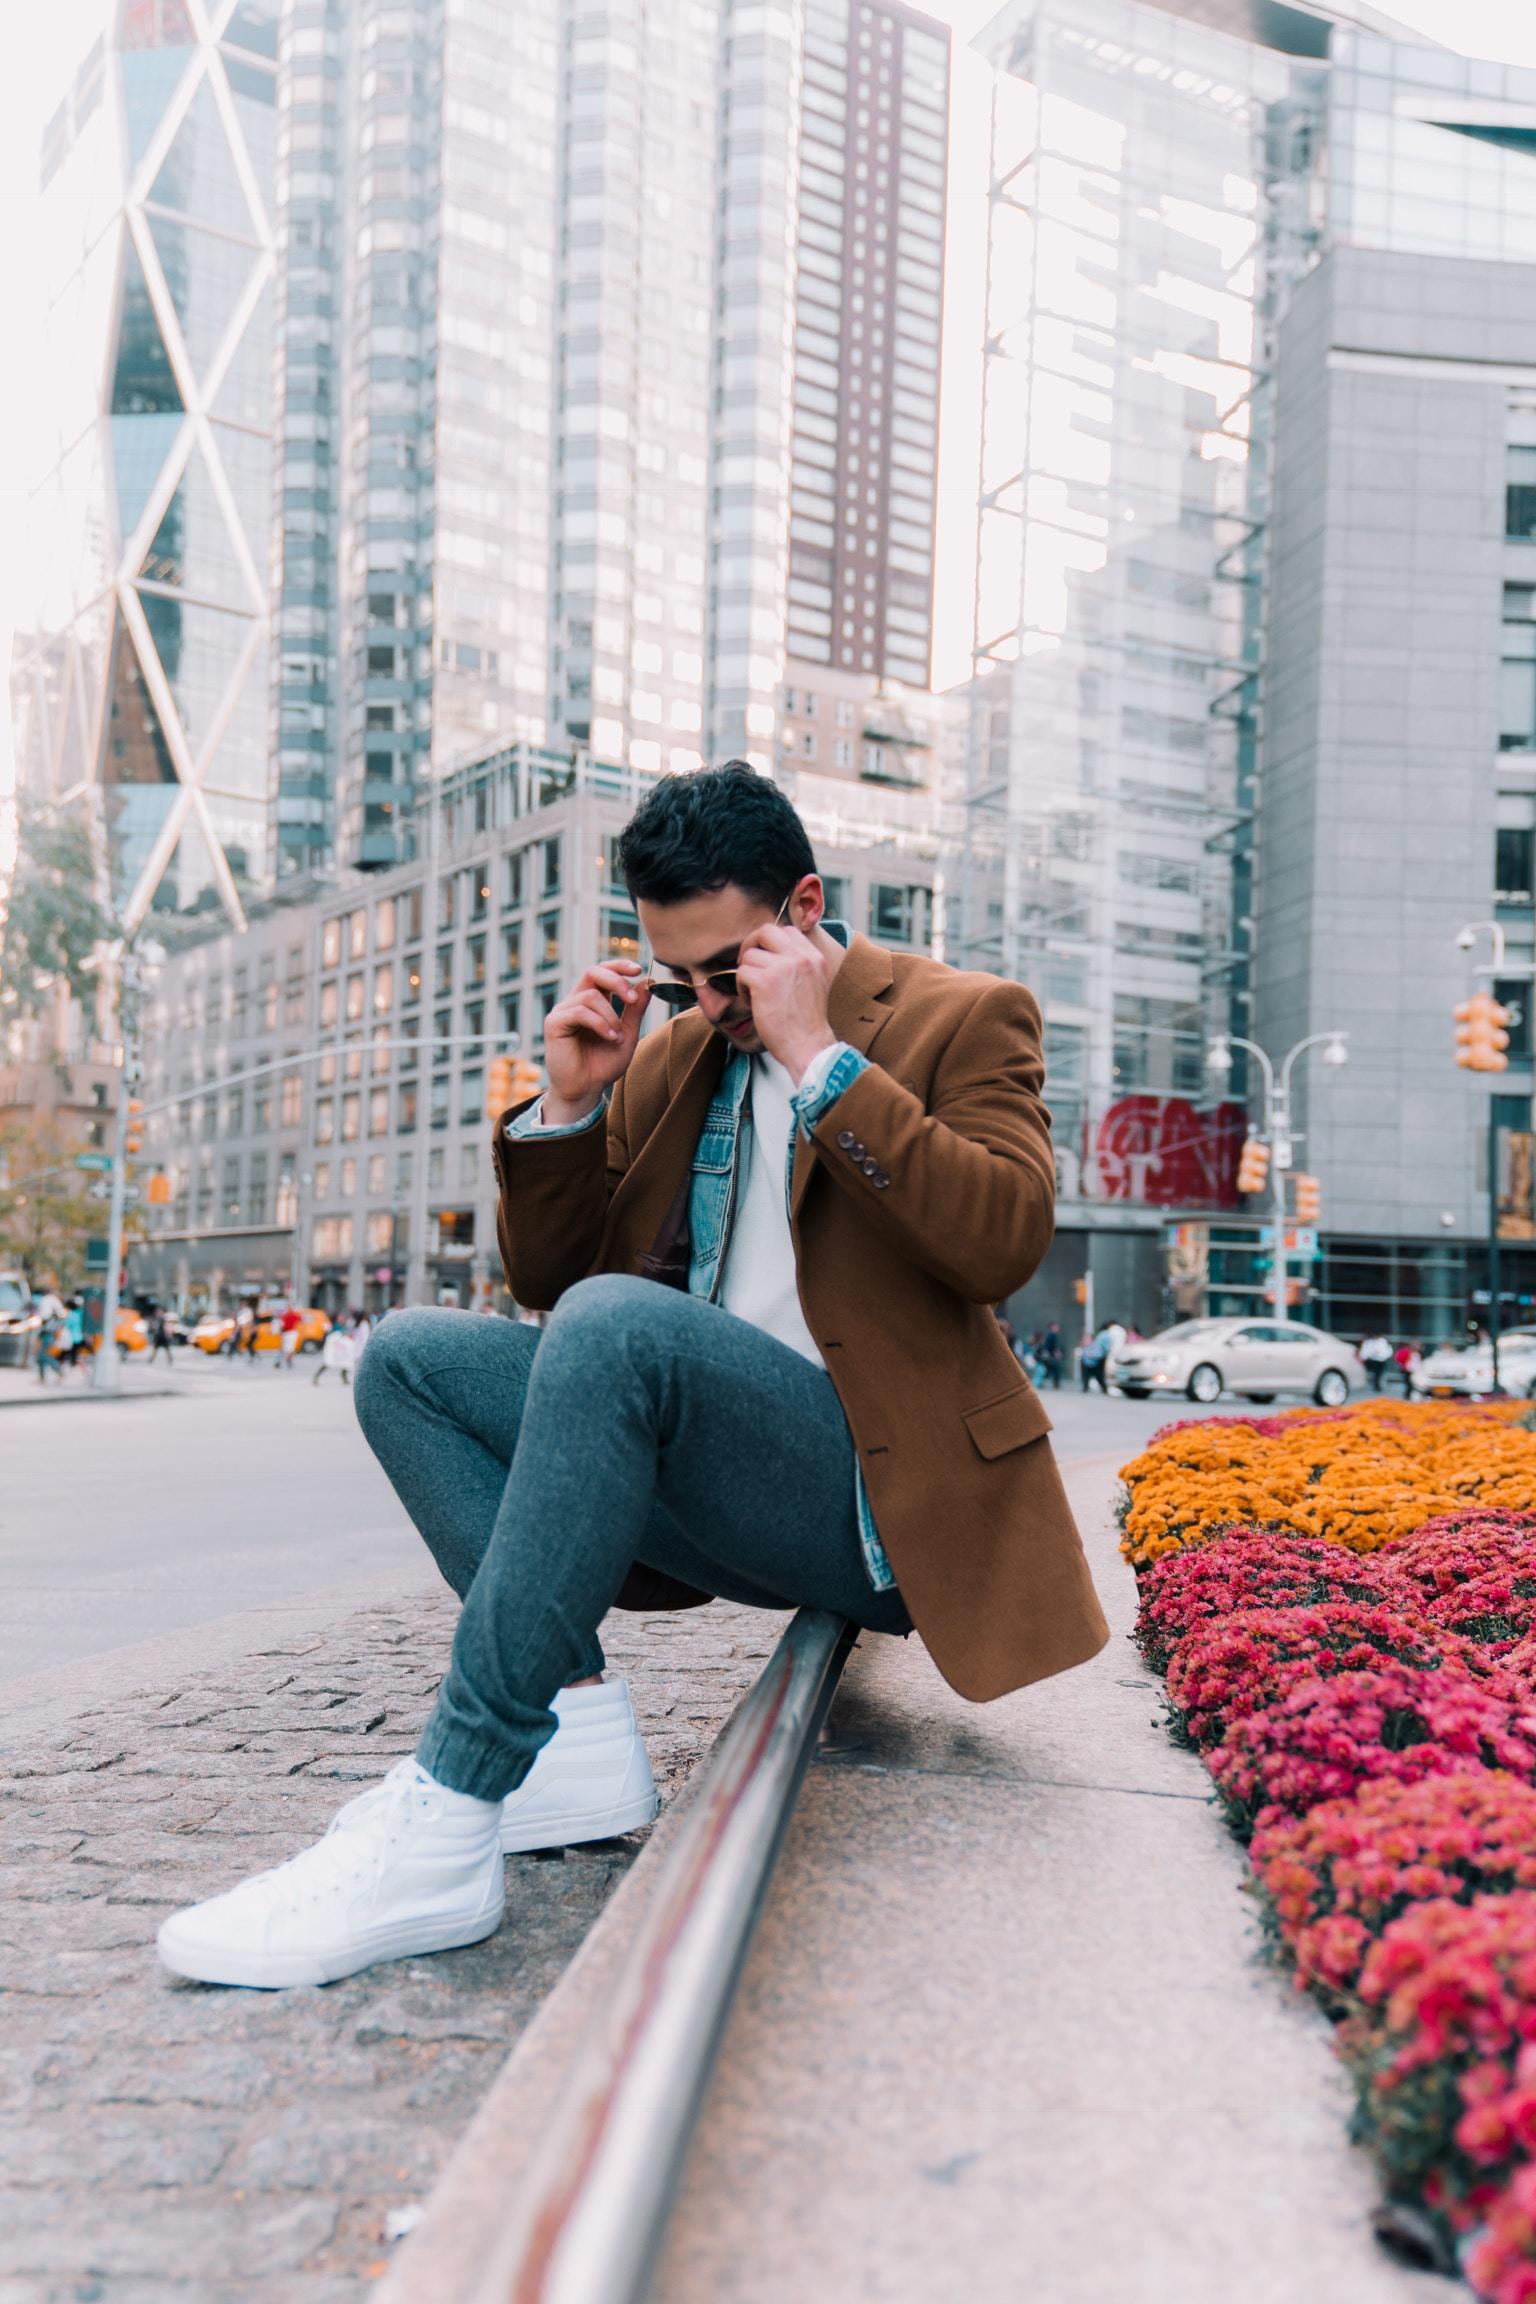 man sitting on sidewalk overlooking white skyscraper during daytime